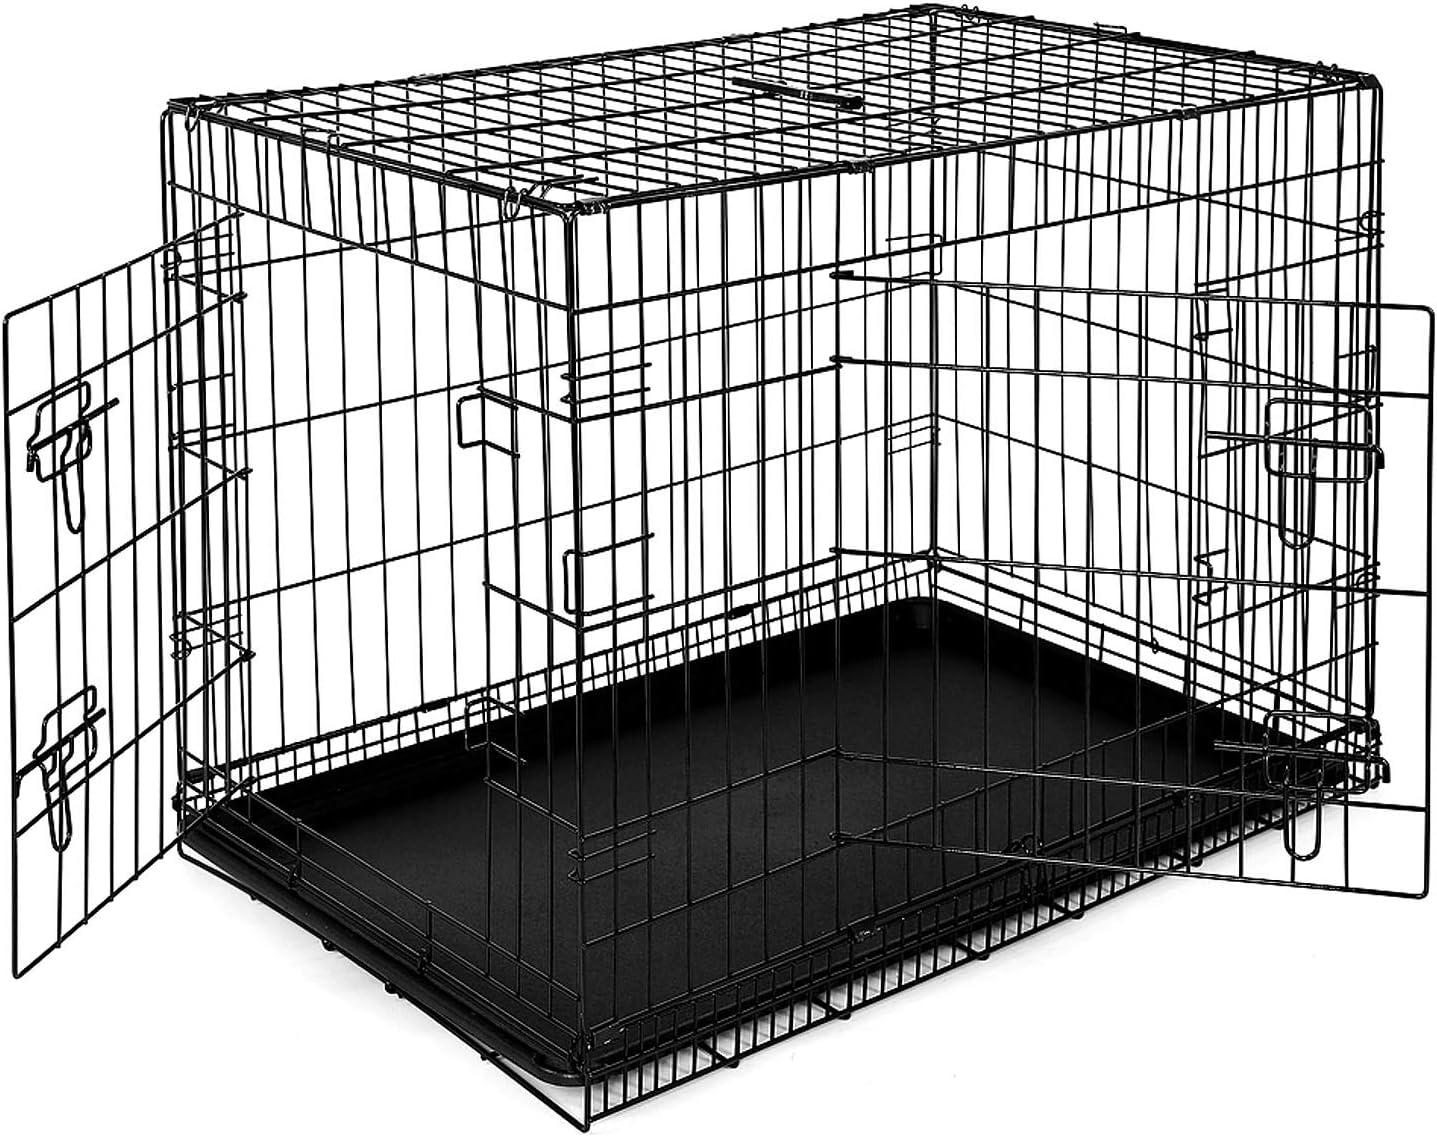 Dibea DC00493, Jaula Plegable de Metal para Perro, Gato y Mascota (2 Puertas), 91 x 58 x 64 cm